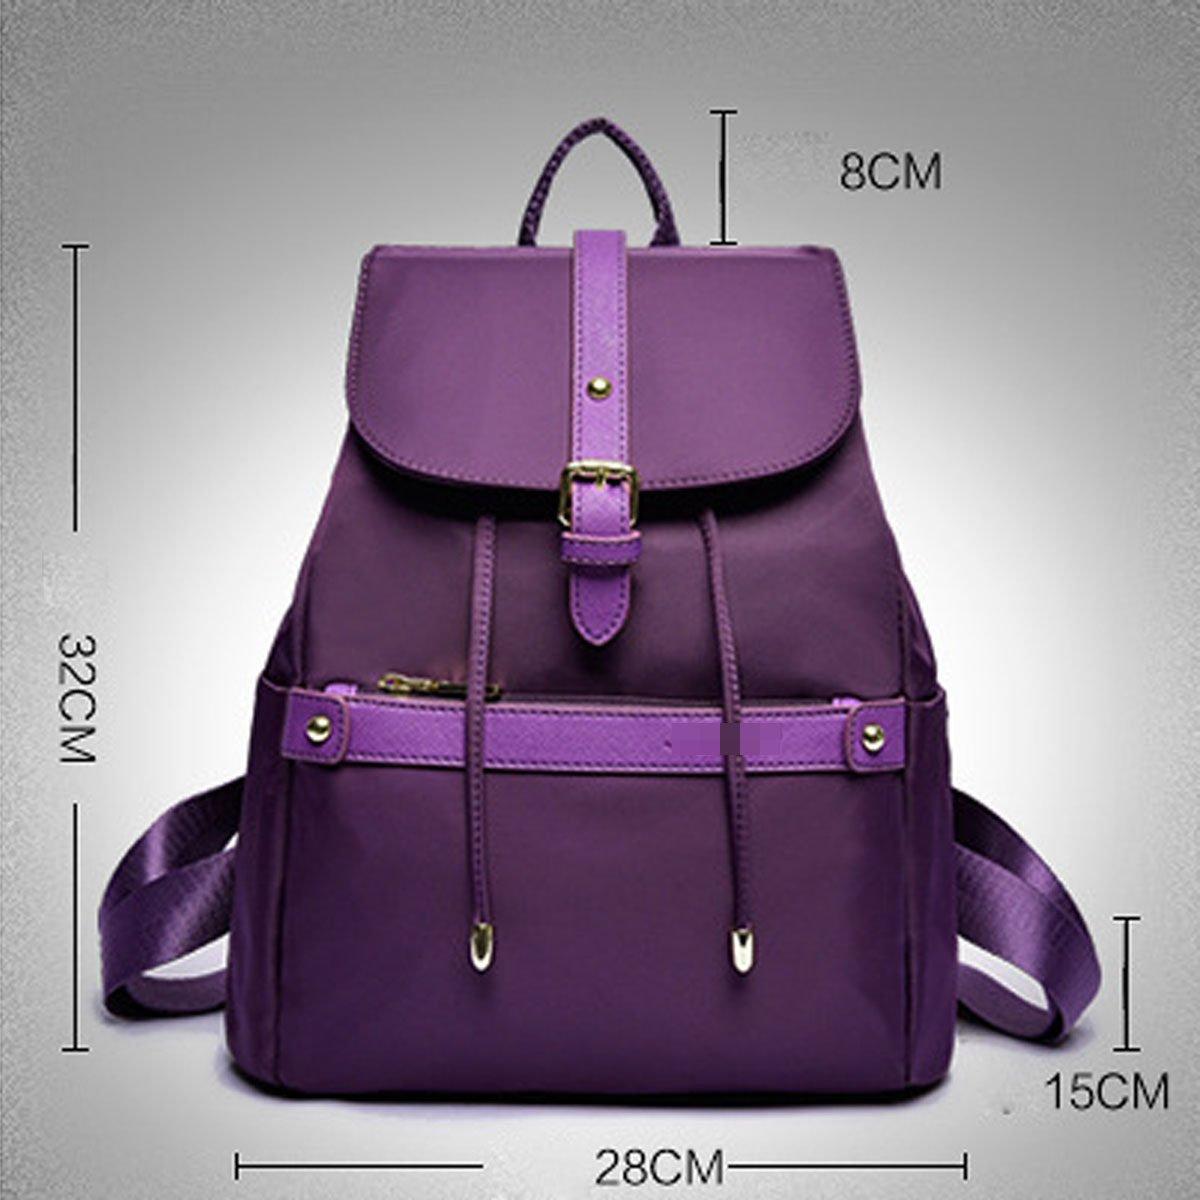 Nylon Nylon Nylon Komfort Damen Atmungsaktiv Wasserdicht Umwelt- Wearable Rucksack Handtasche B074CY928W Rucksackhandtaschen Empfohlen heute d36083